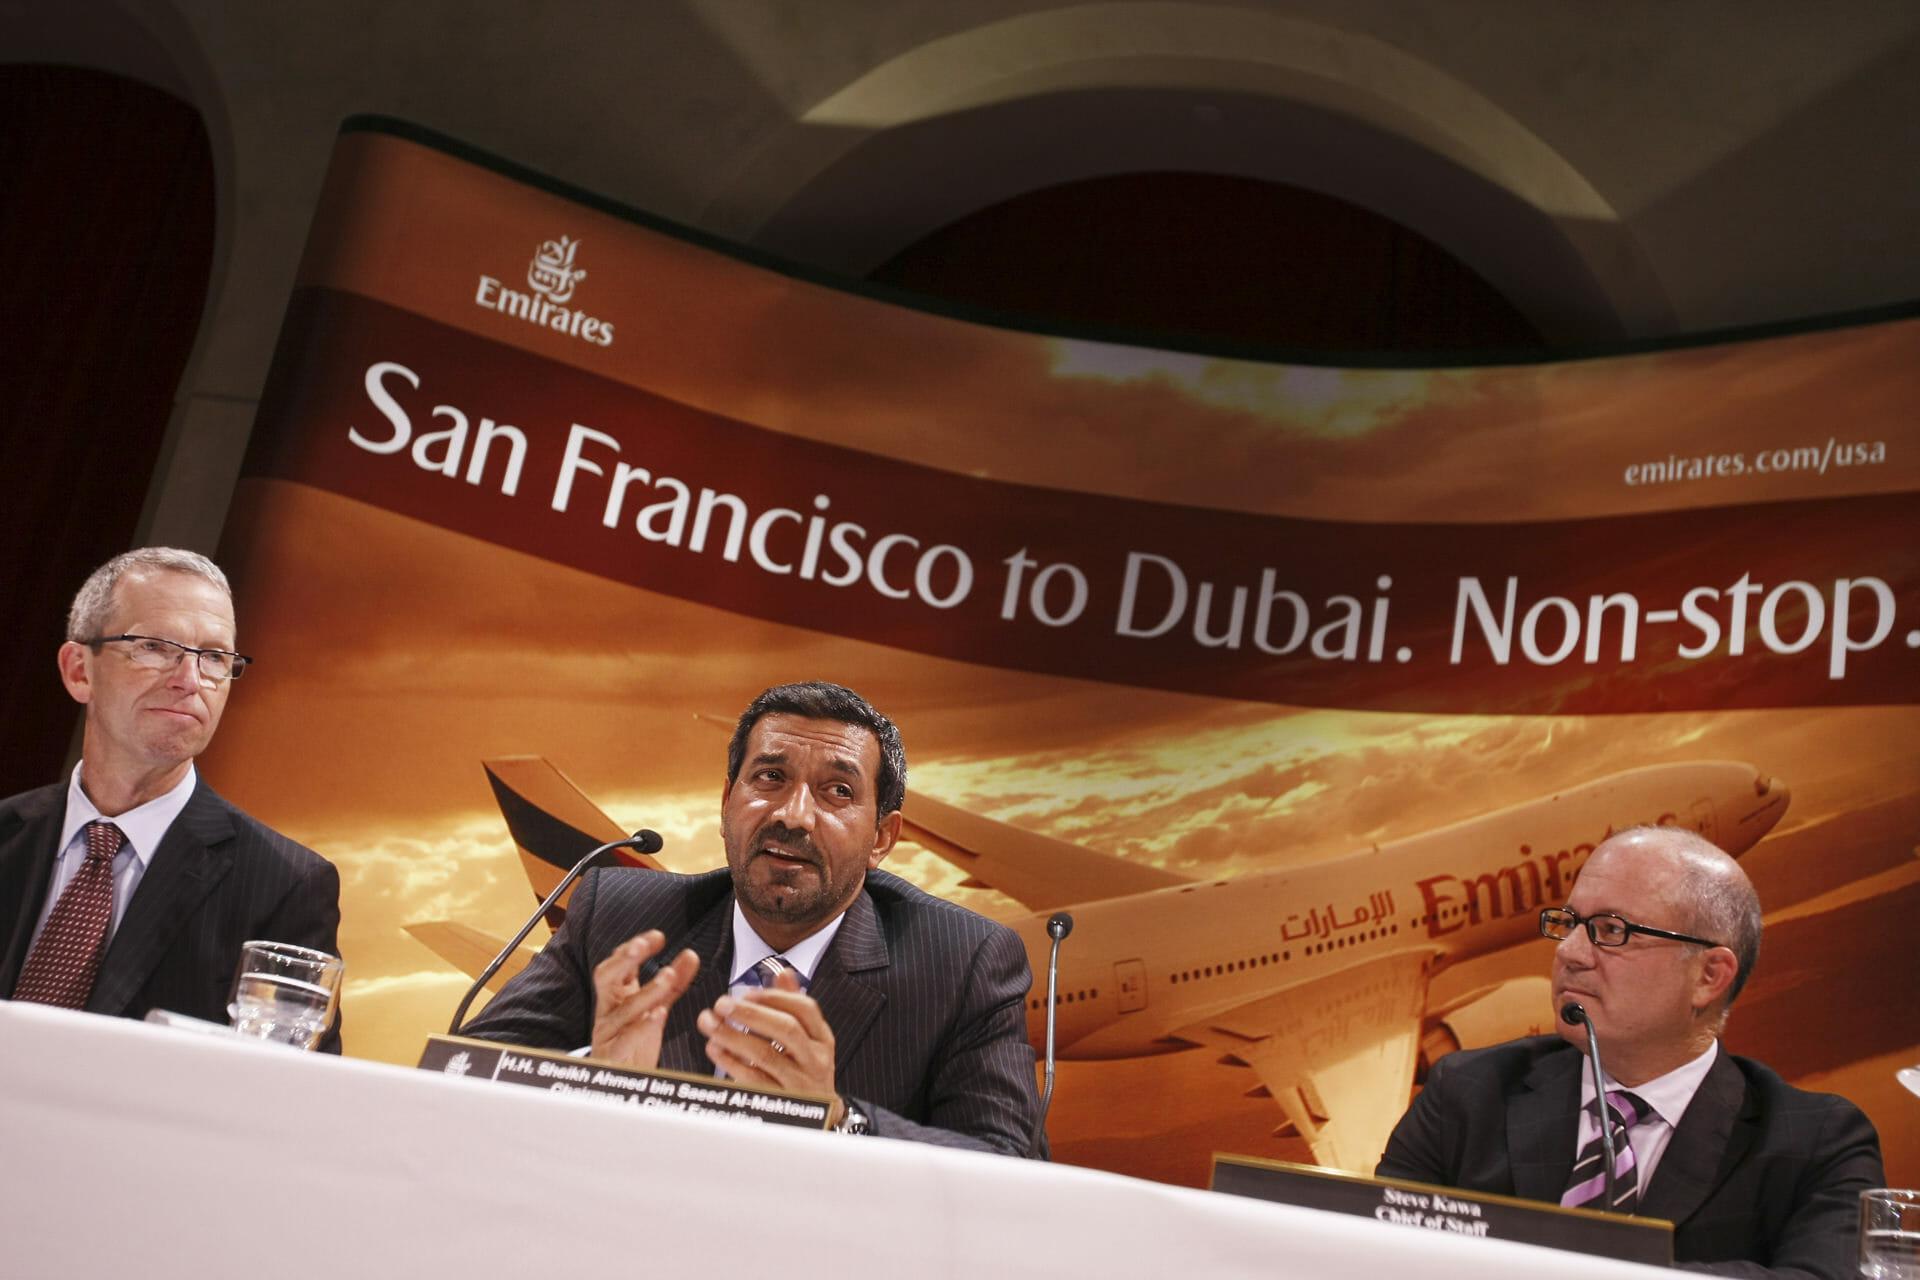 Emirates Air Inaugural Flight Press Conference